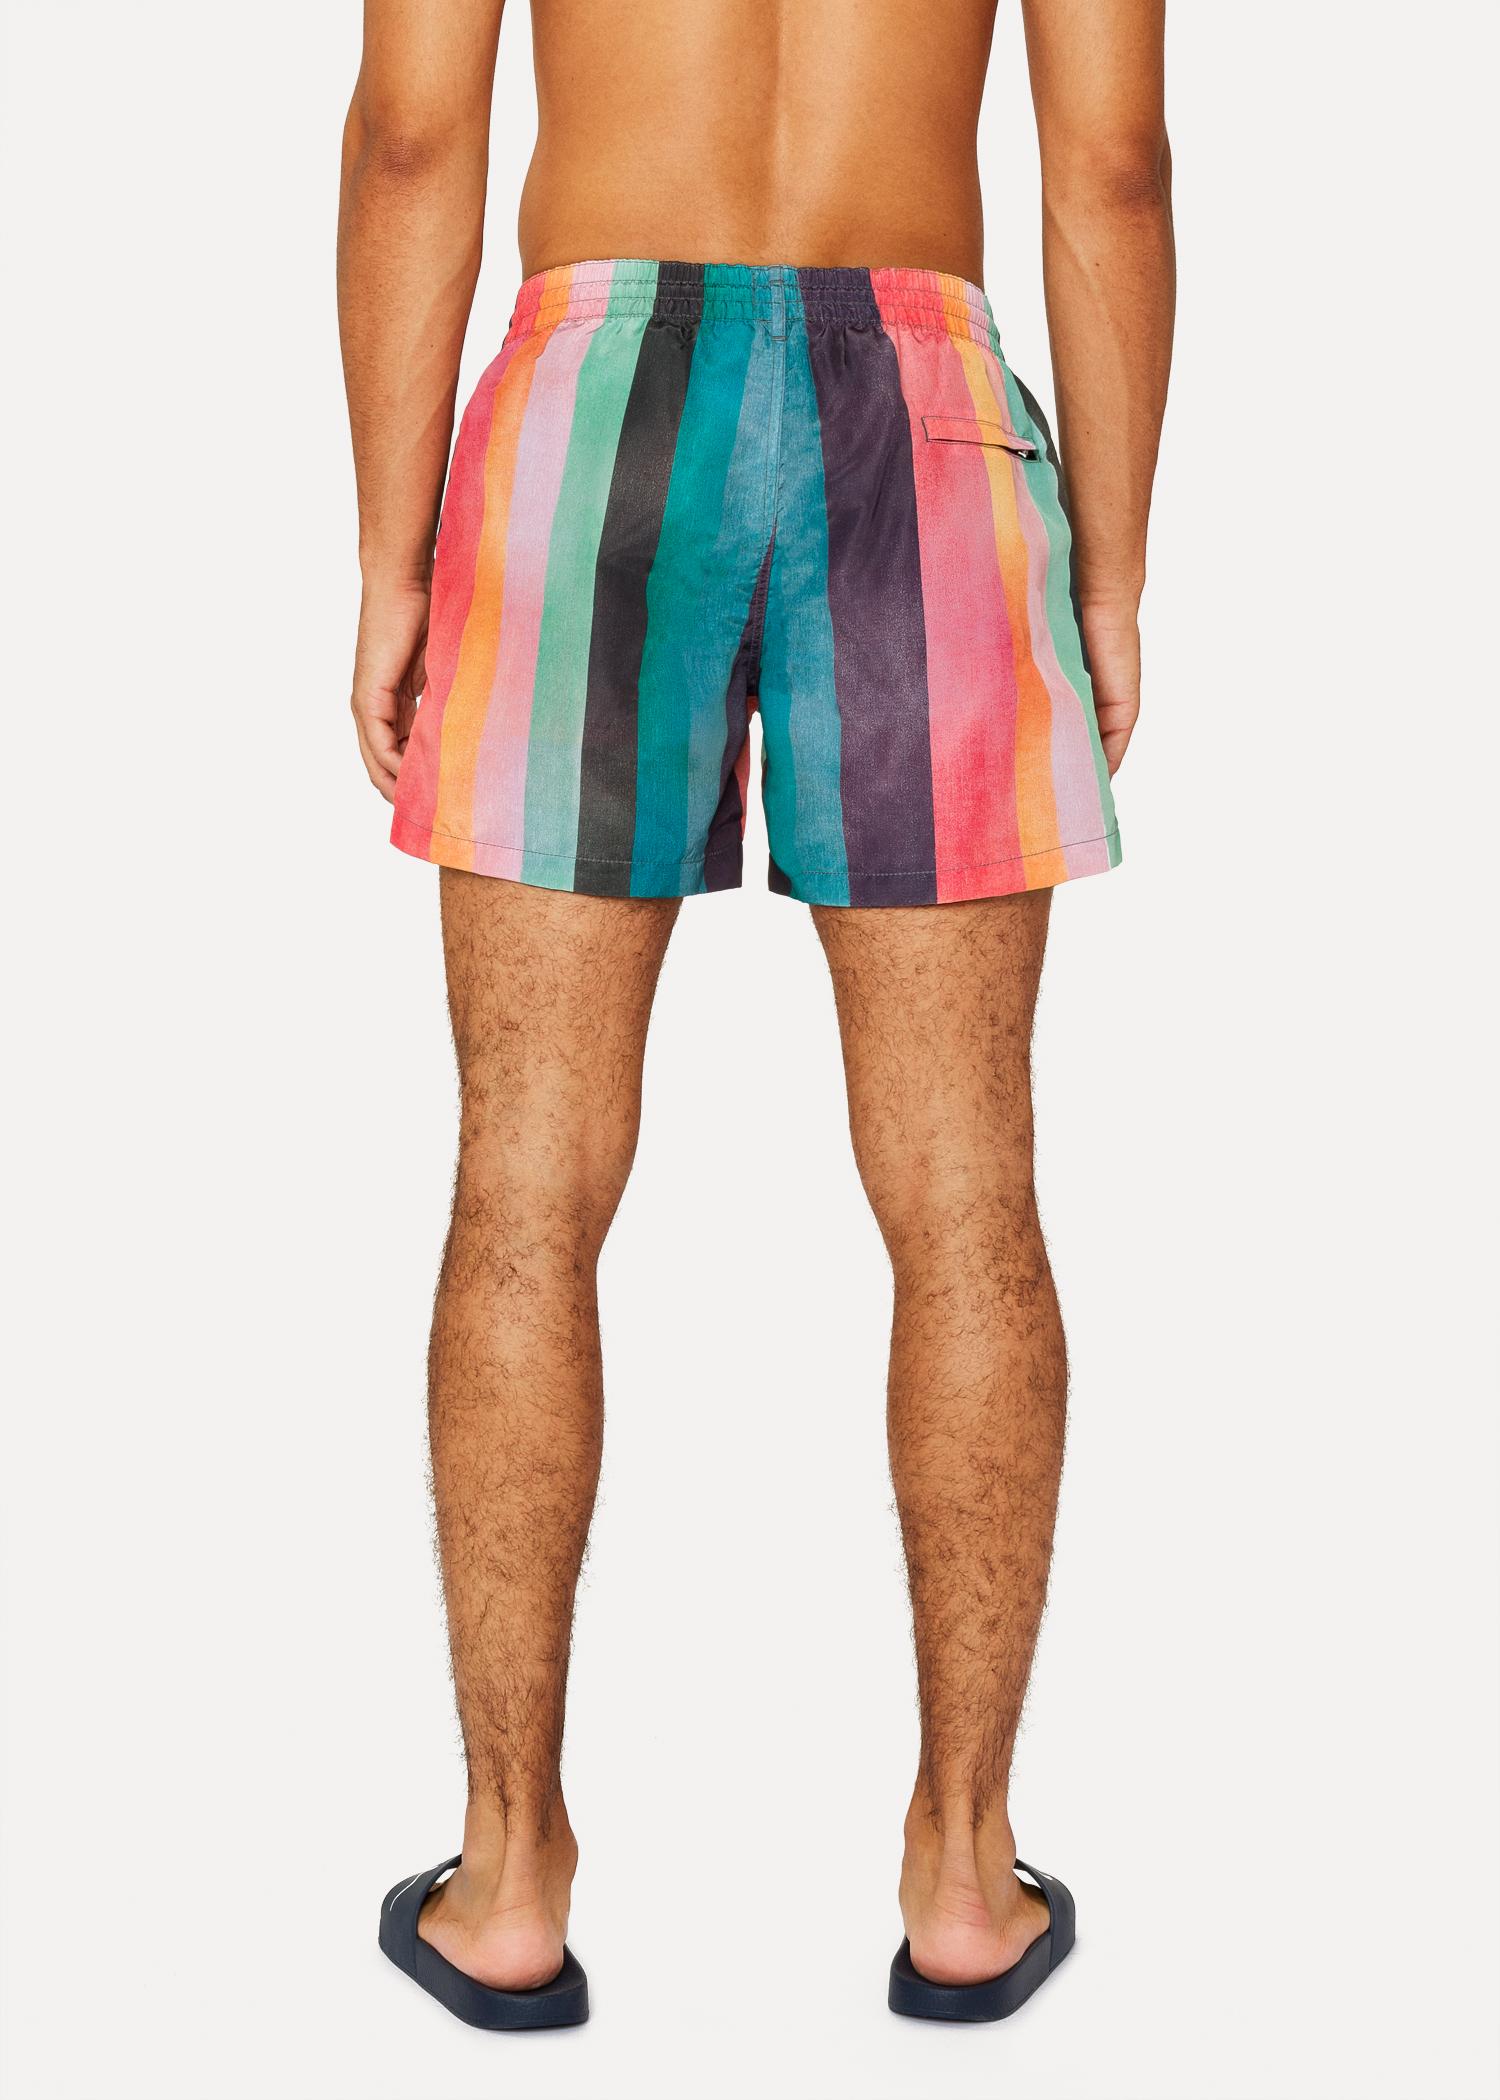 813e60f4e6 Men's 'Artist Stripe' Print Swim Shorts by Paul Smith